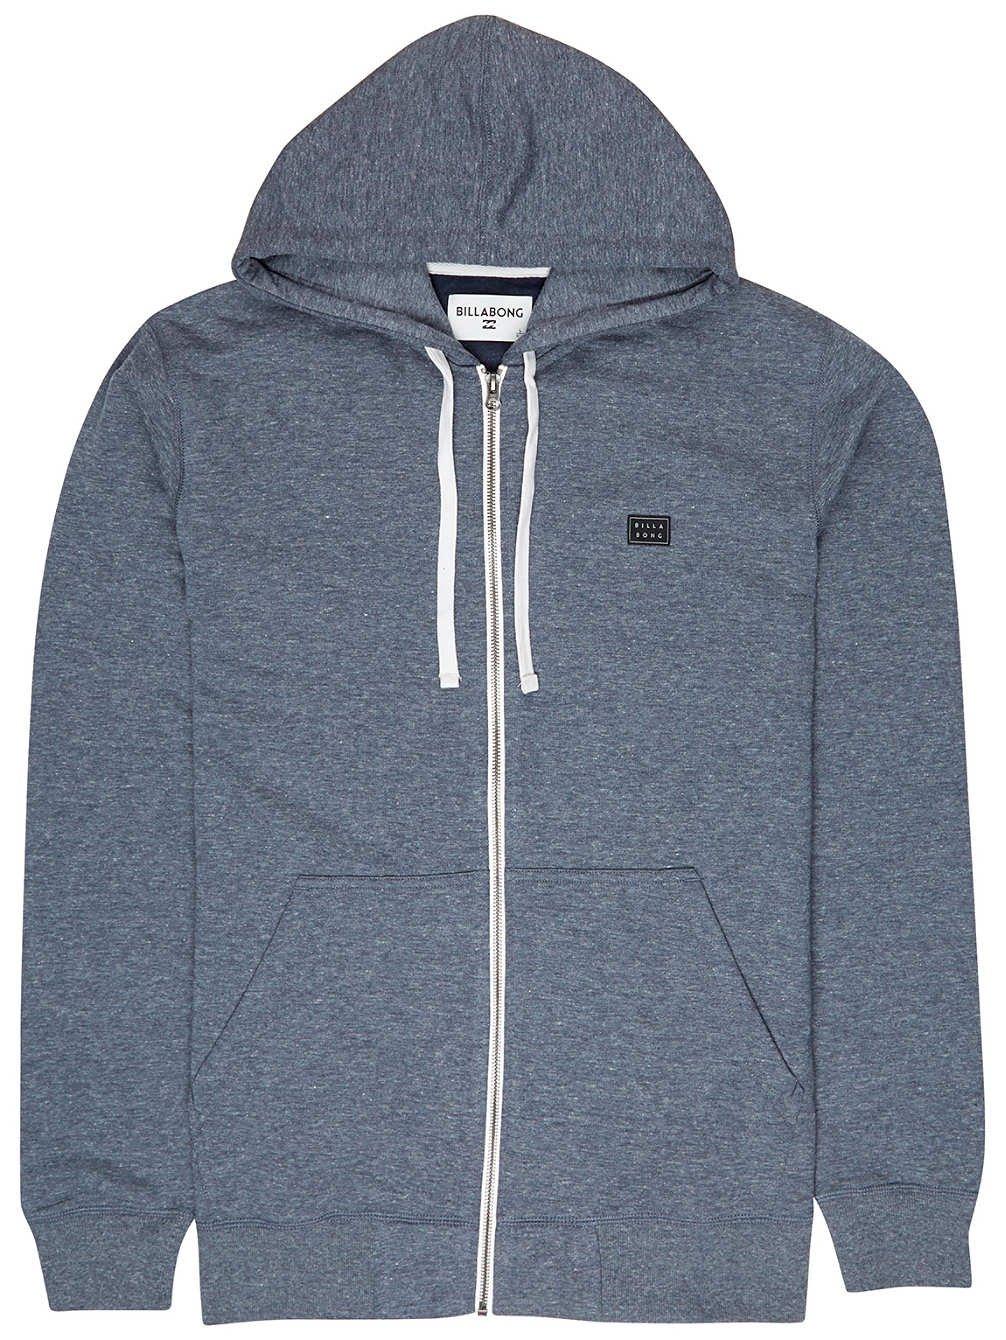 BILLABONG All Day Zip Hood Jersey, Hombre, Azul (Navy 21), X-Large (Tamaño del Fabricante:XL)